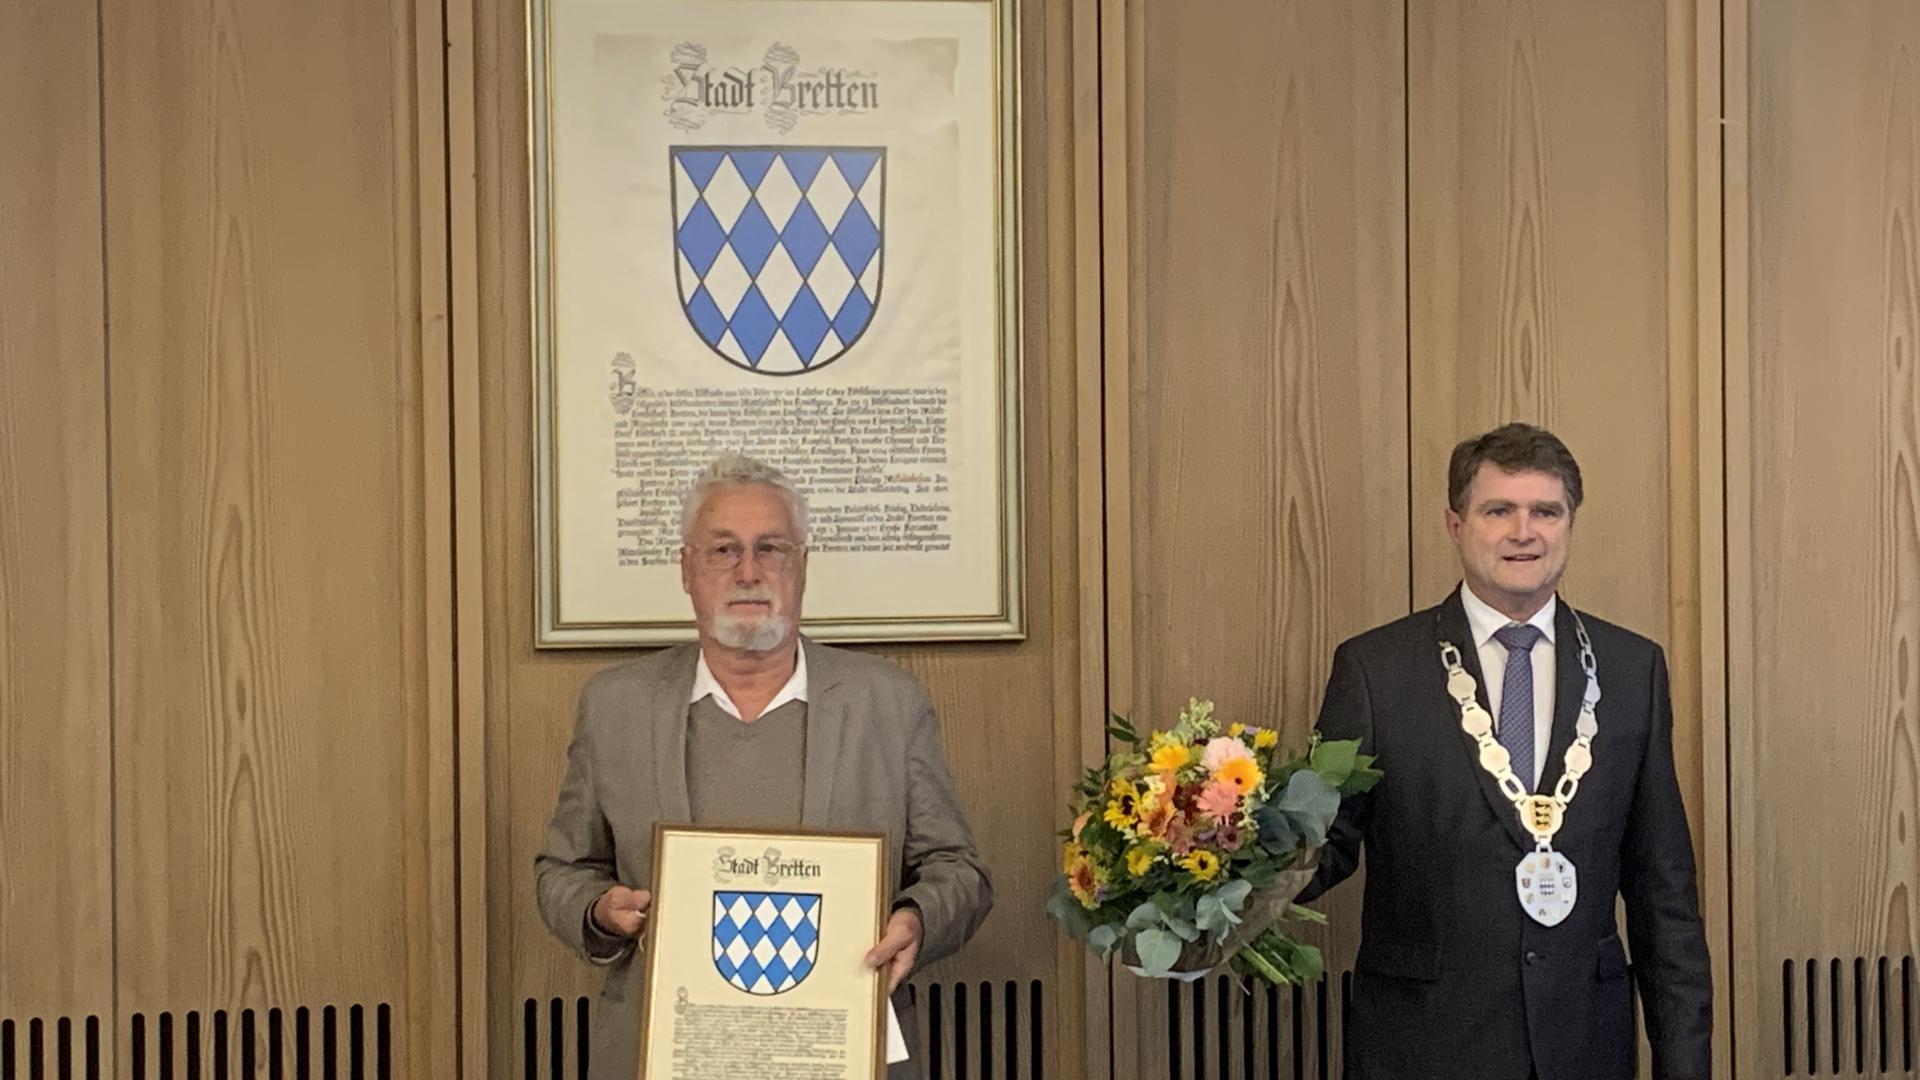 Verabschiedung von Stadtrat Hans Joachim Reiber (links) durch Brettens OB Martin Wolff (rechts).